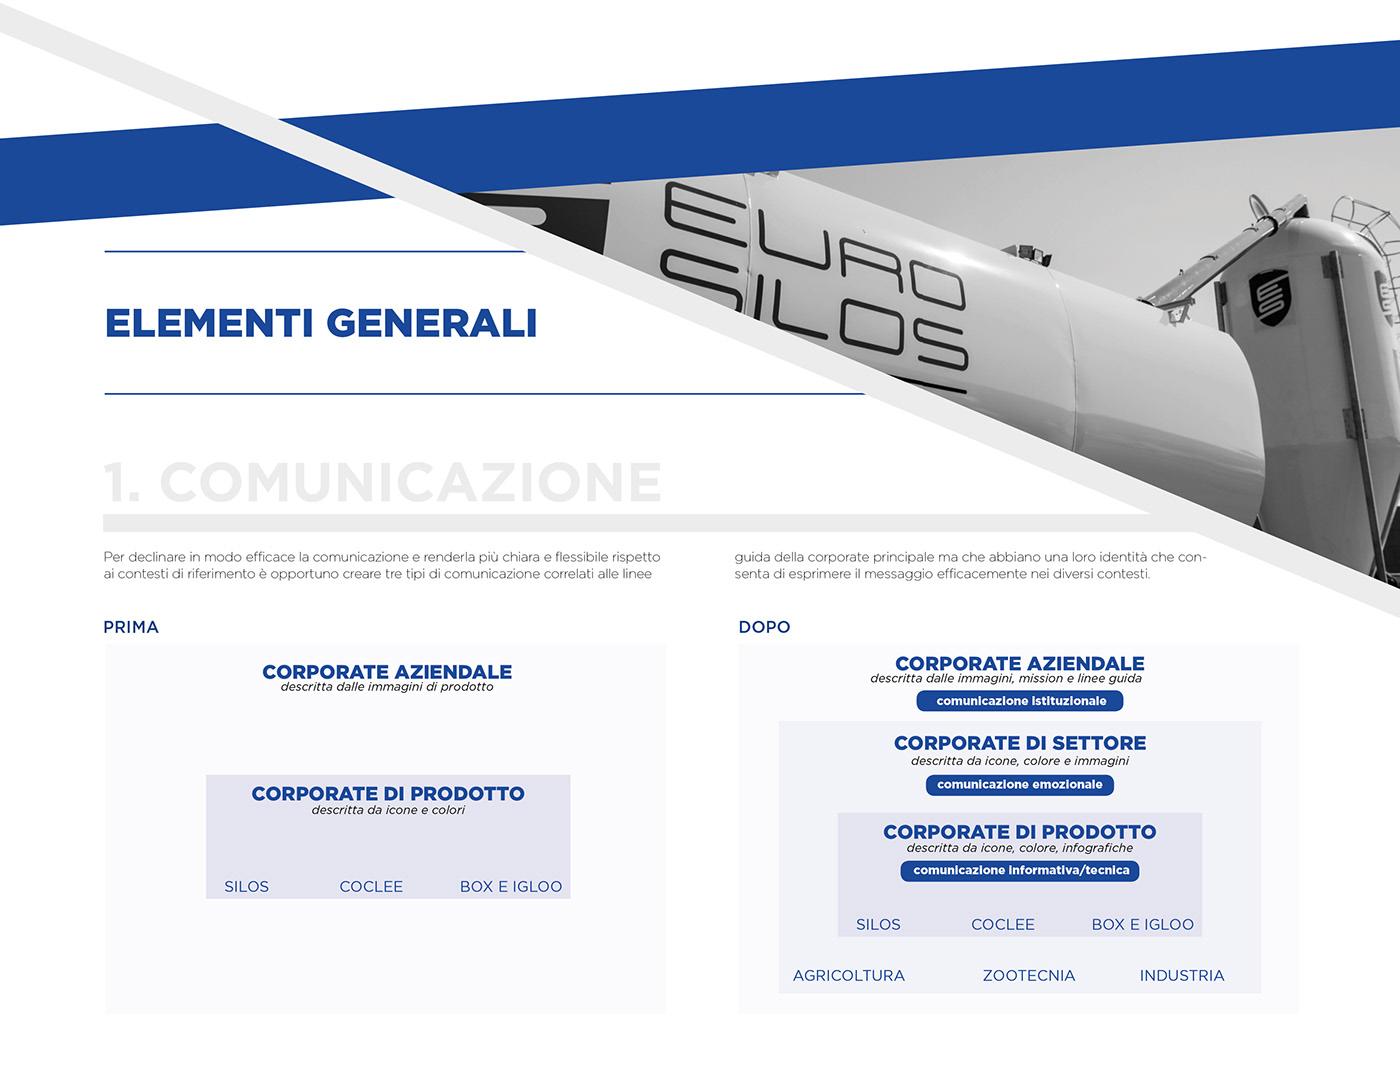 brand identity branding  Corporate Identity icon design  identity Identity redesign Rebrand editorial graphic infographic